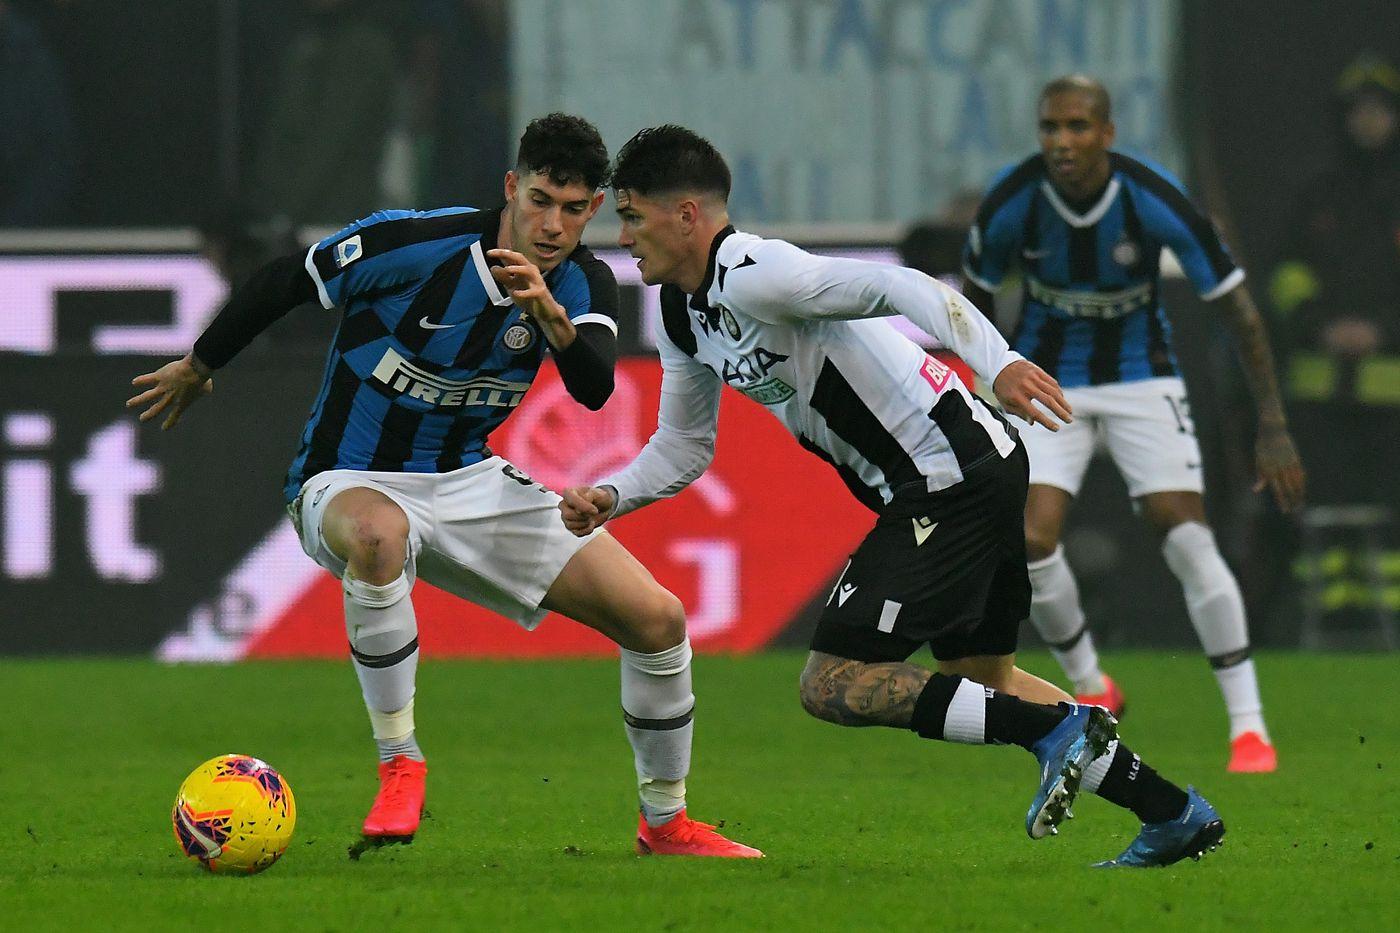 Udinese inter betting preview nfl ogtv csgo betting